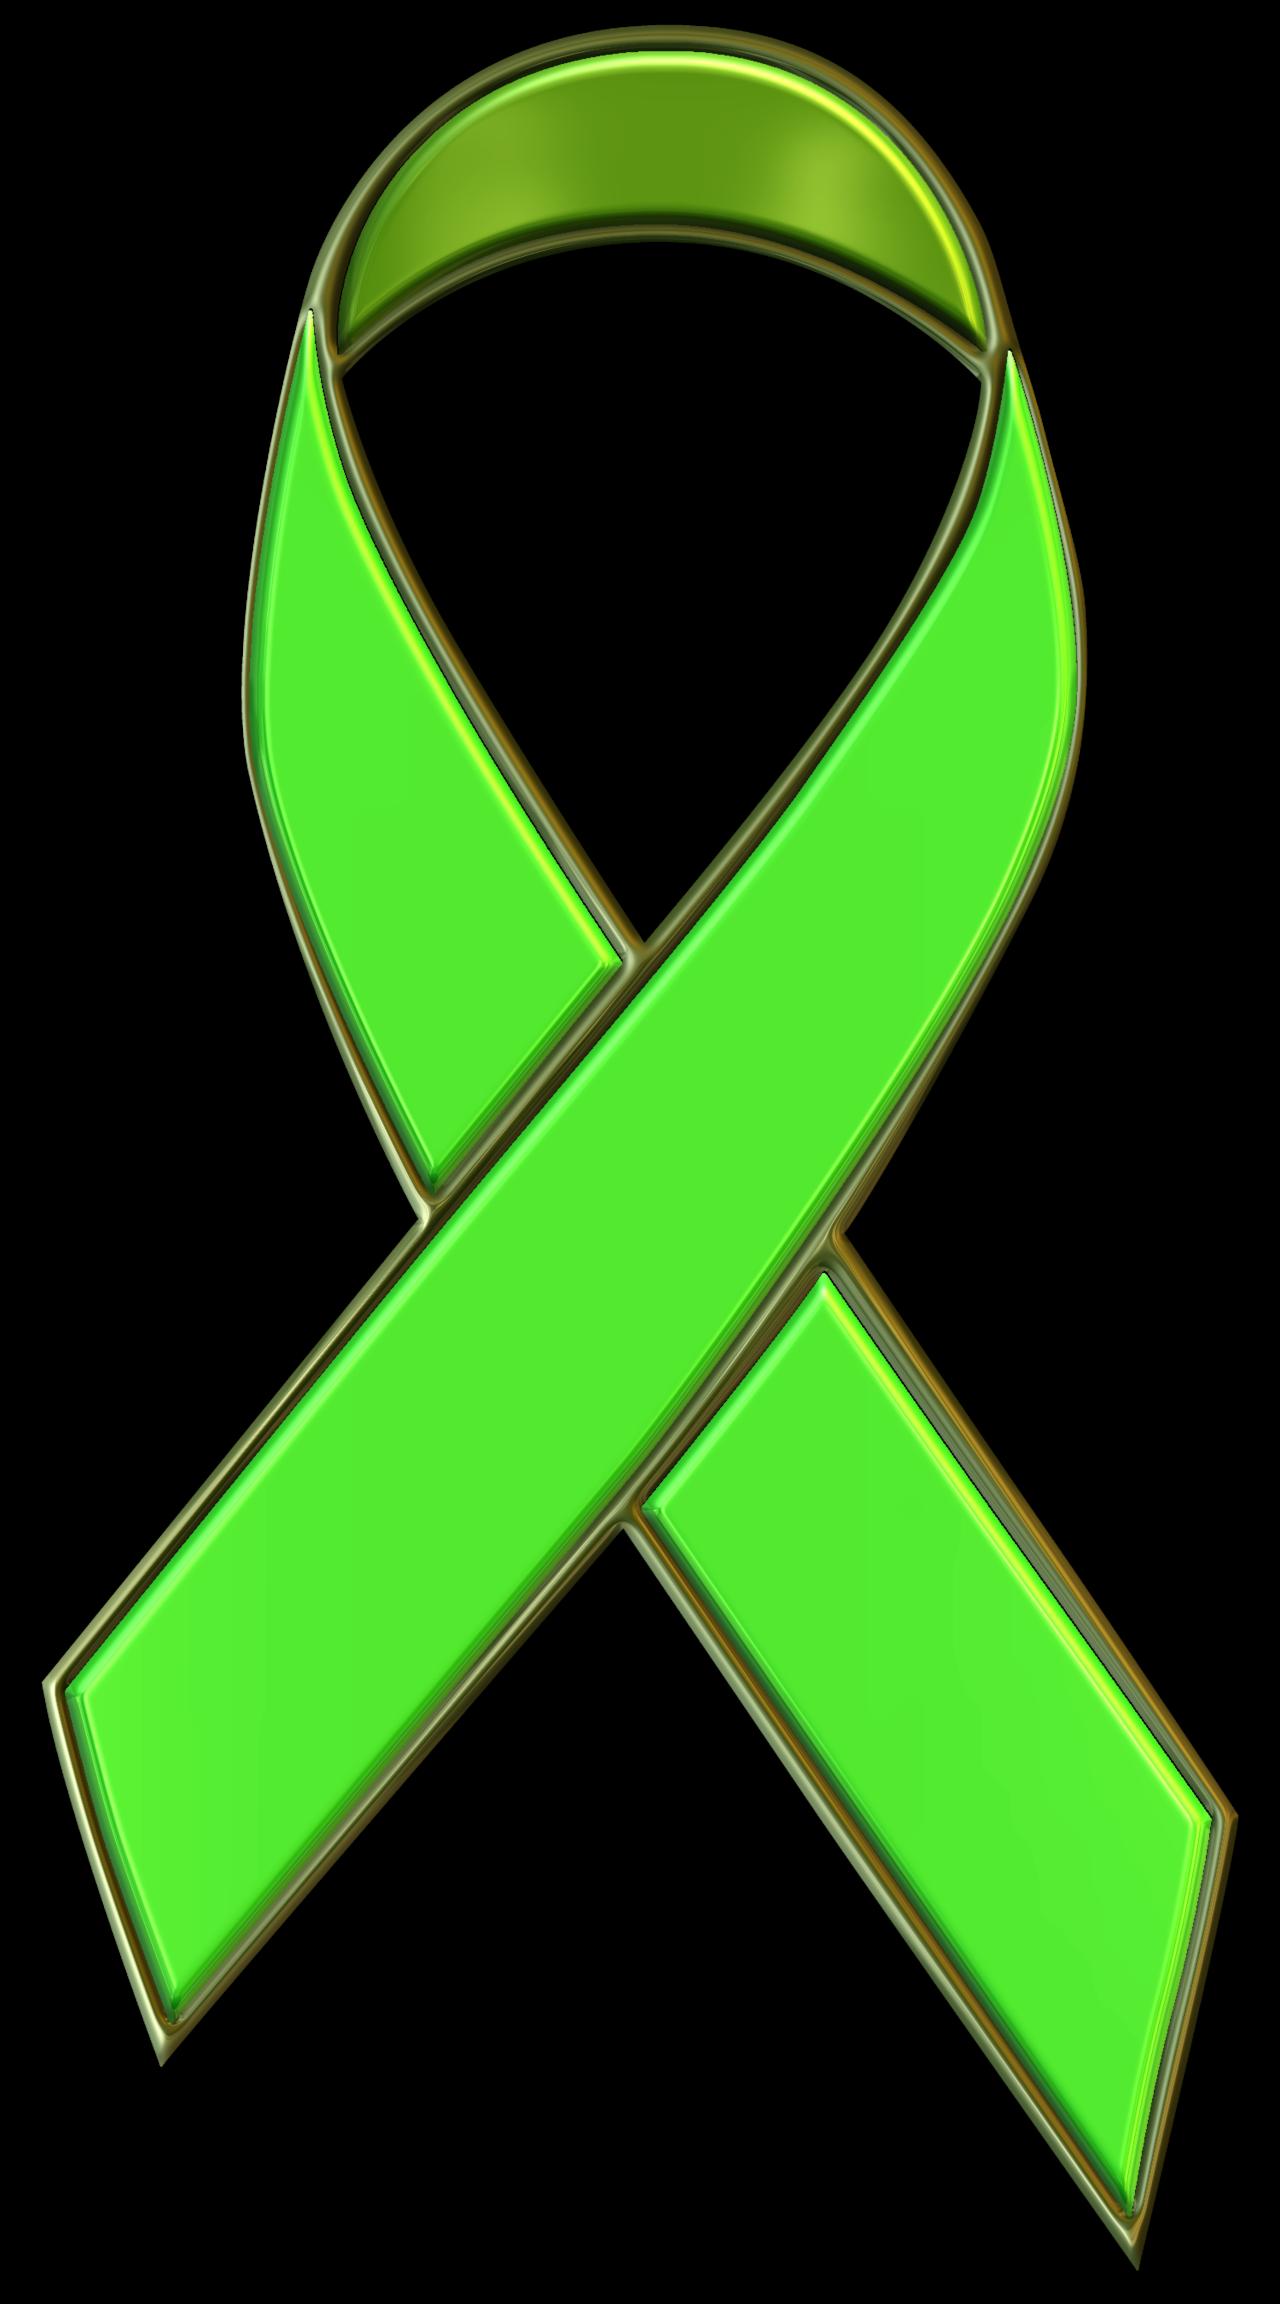 Green Ribbon Clipart.